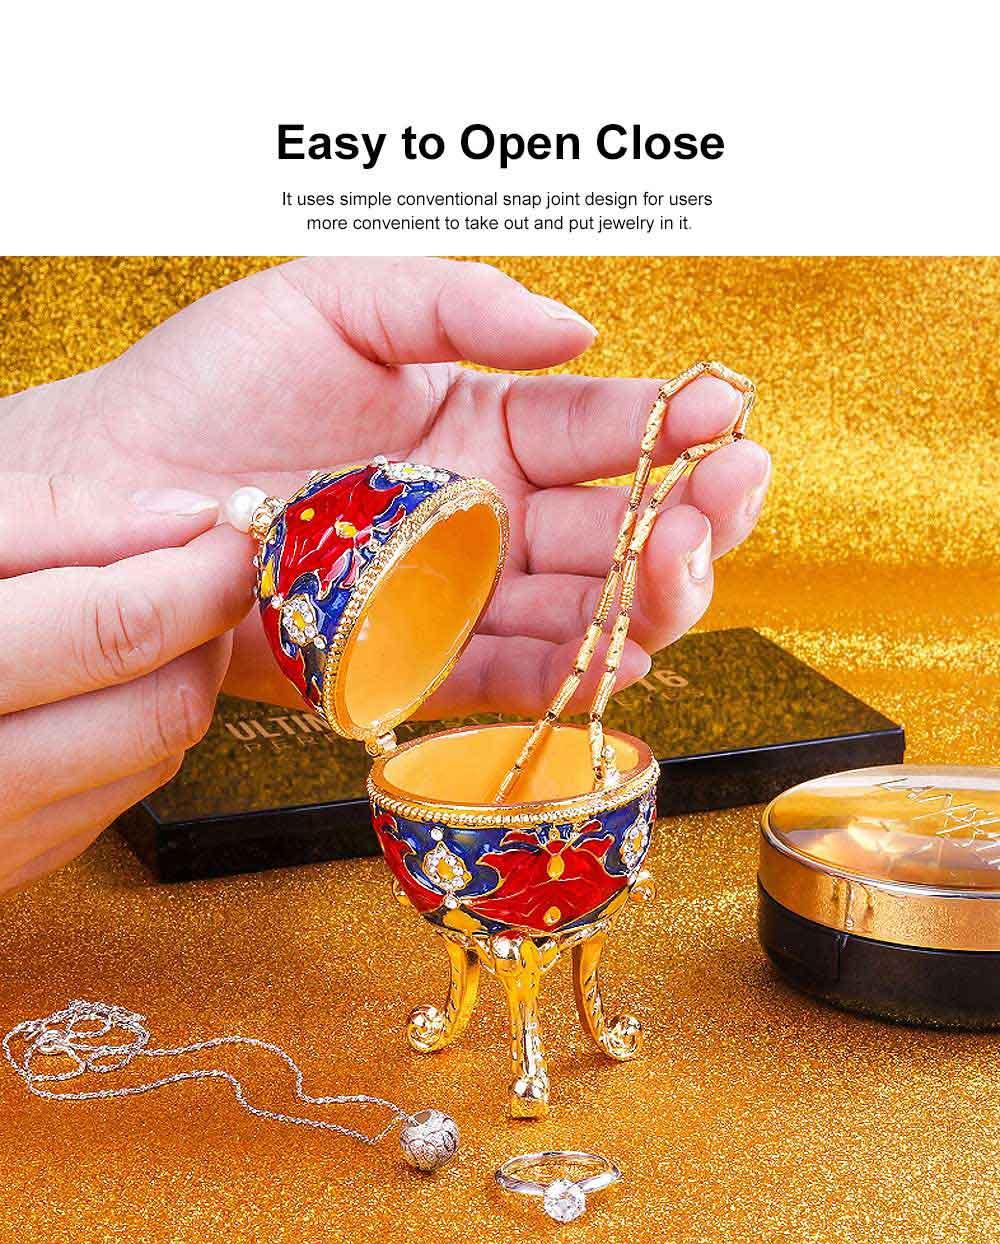 European Egg Shape Jewelry Box, Luxuriant Colored Enamel Trinket Keepsake Storage Box Collection Holder 4